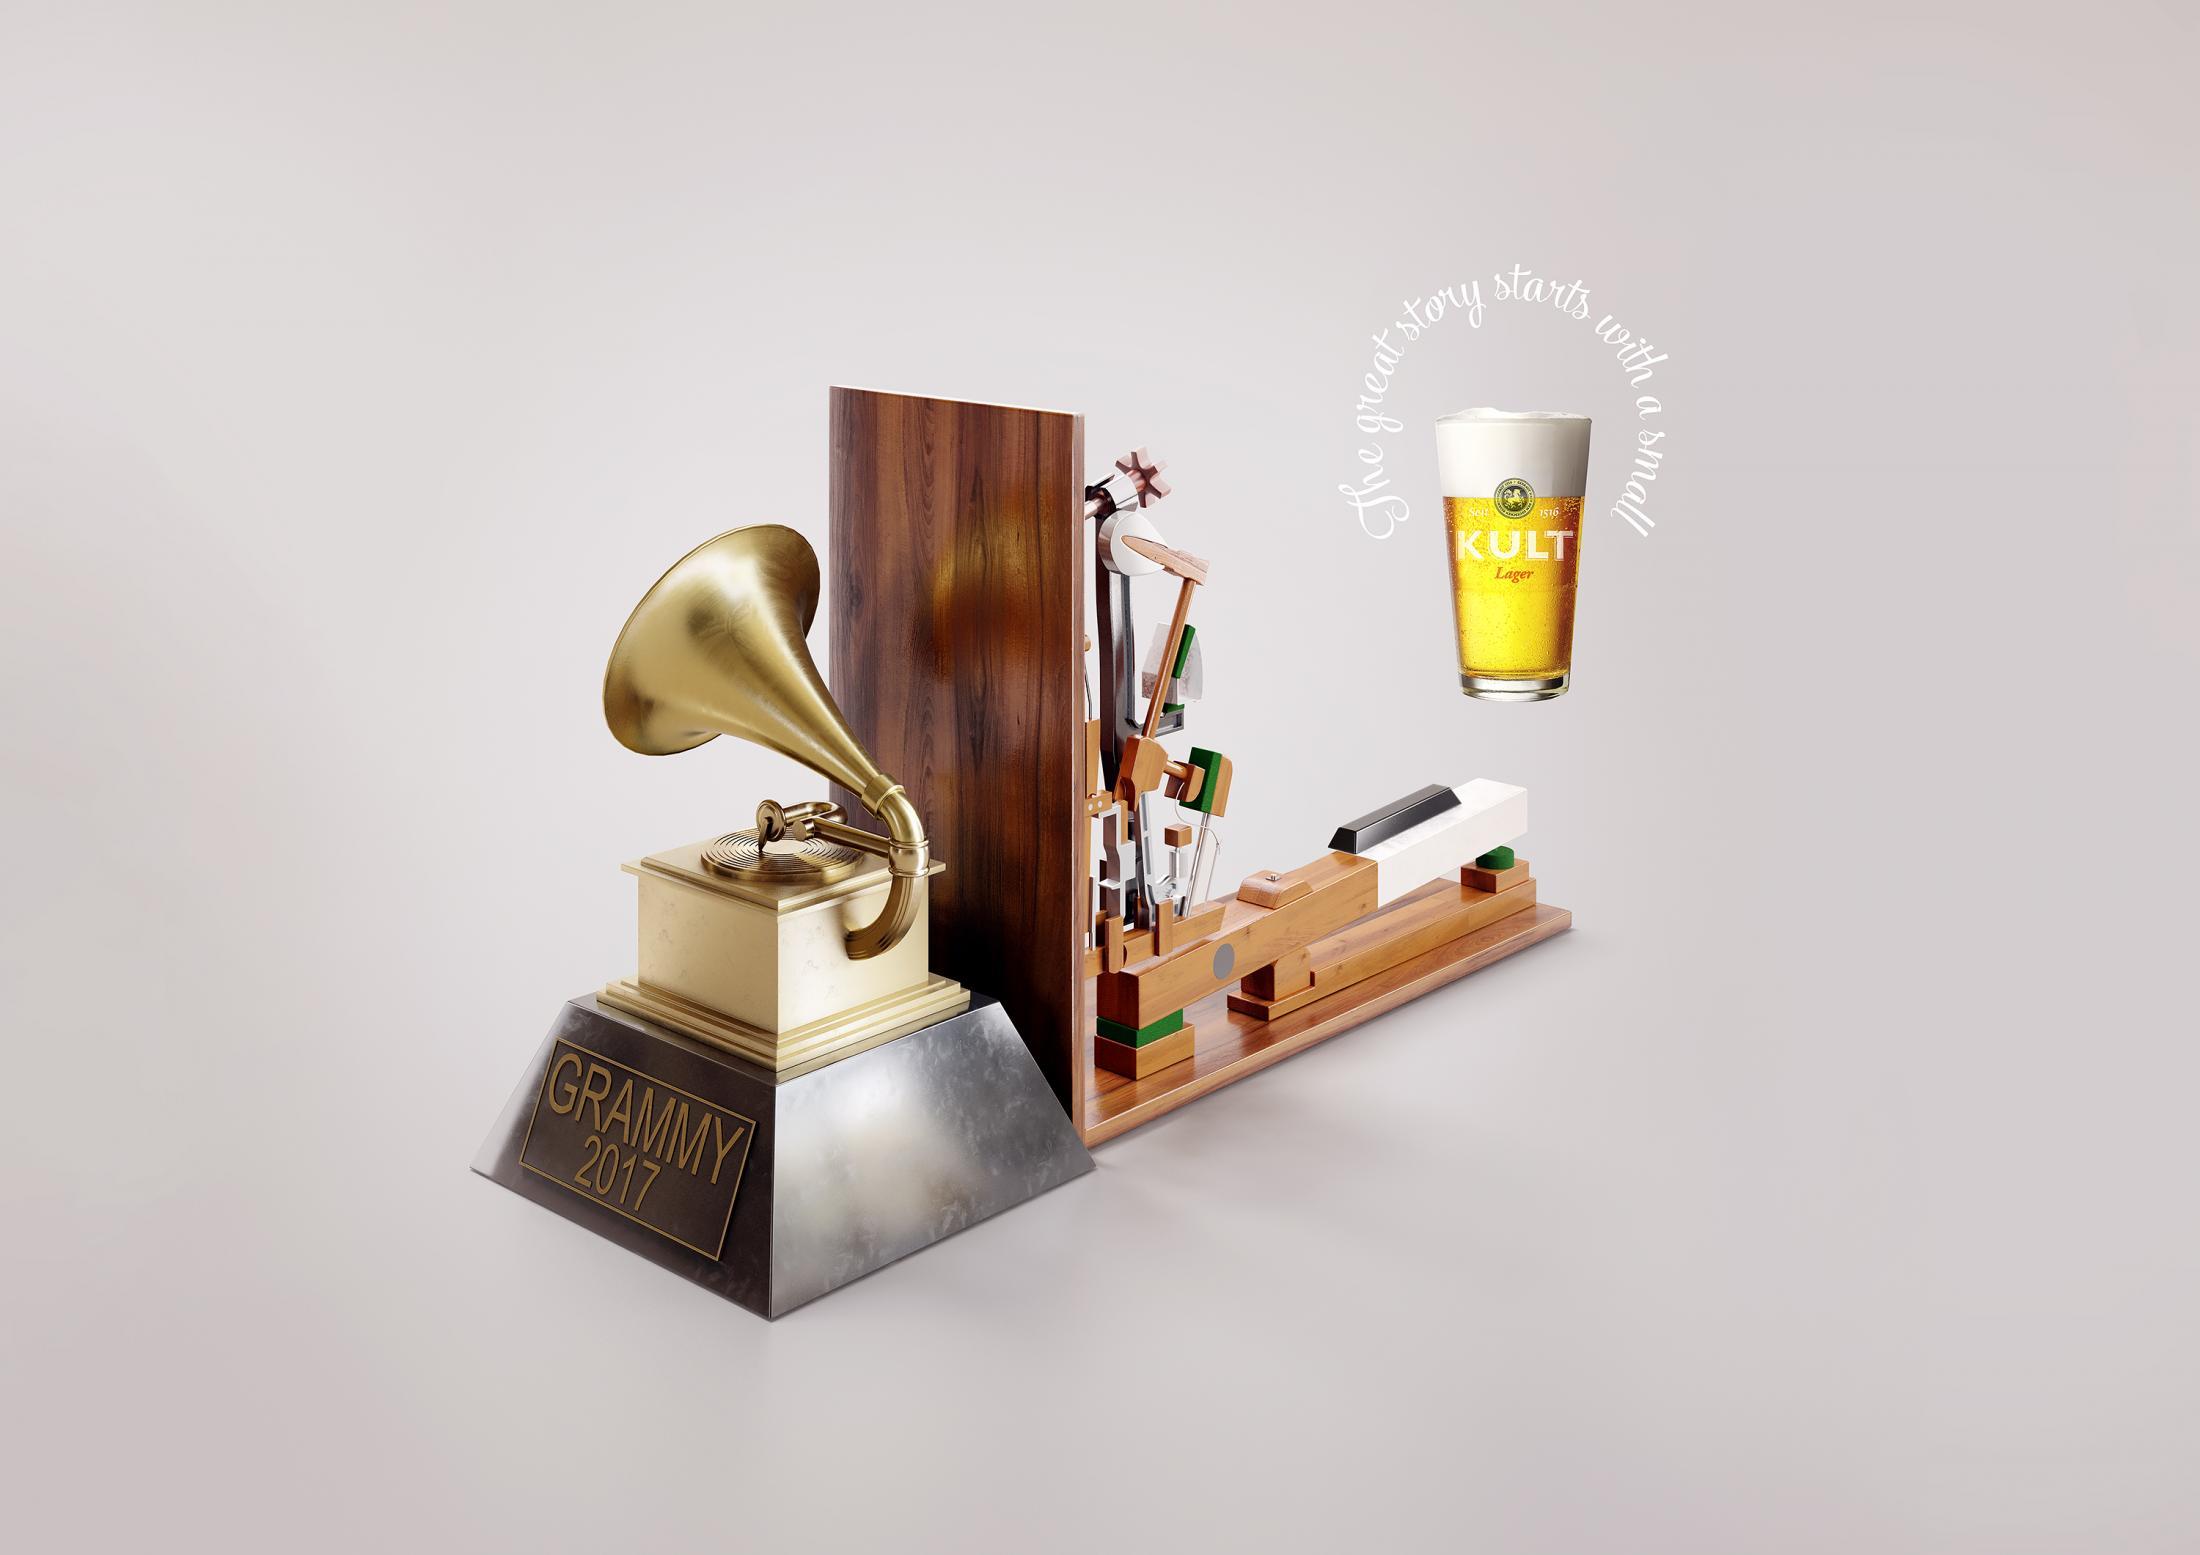 Kult Print Ad - Kult Grammy